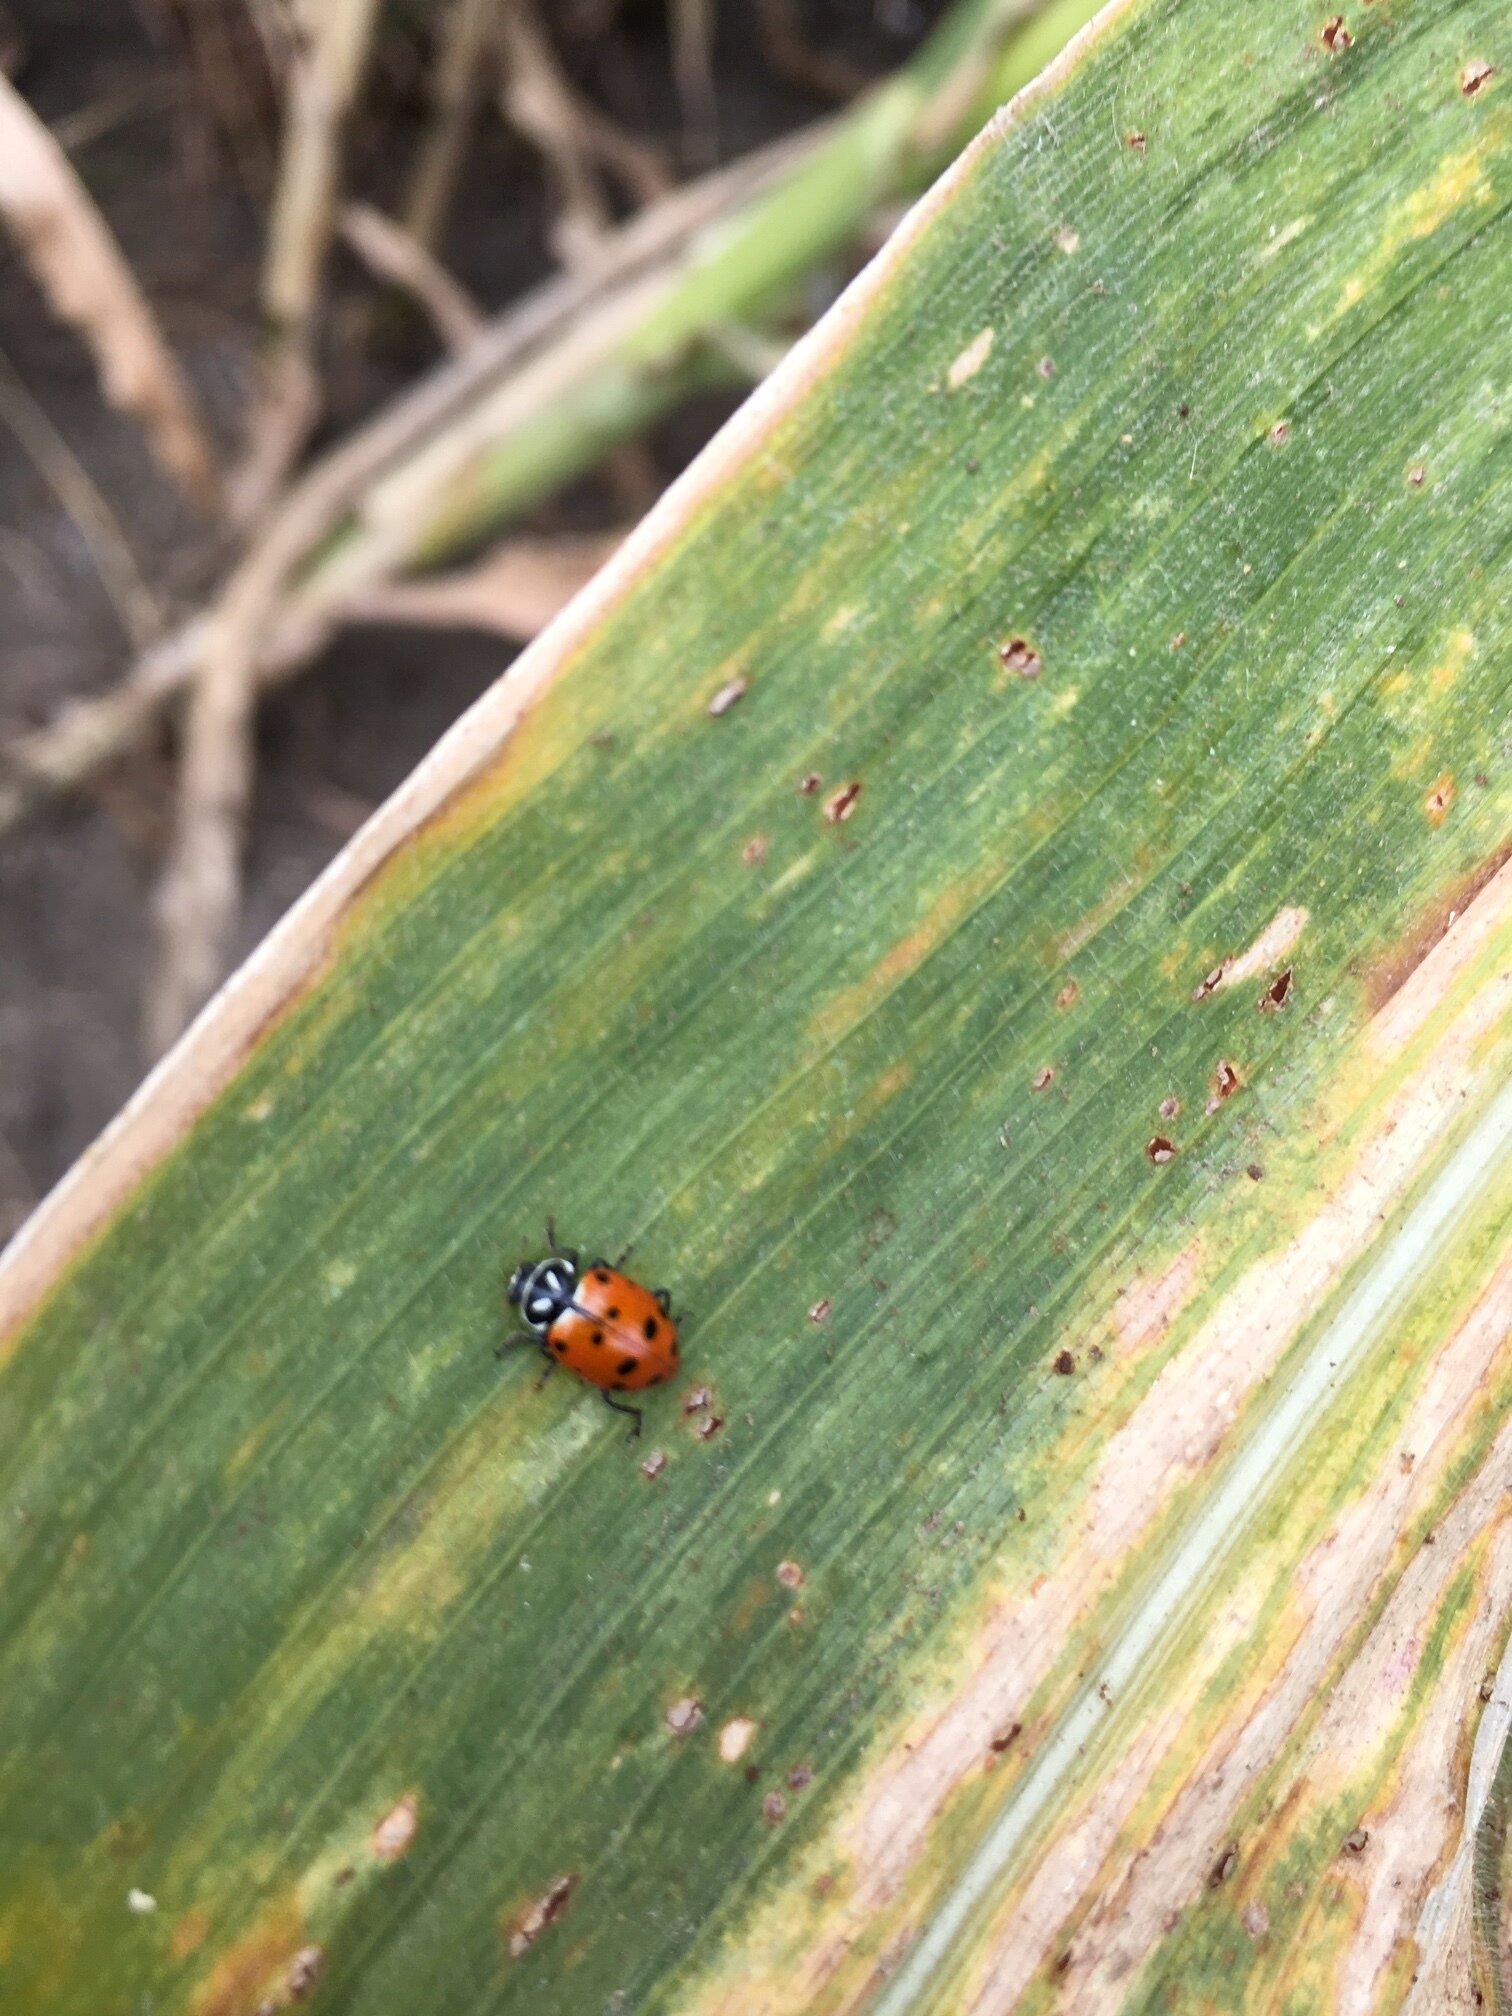 Met this fellow in a corn maze.